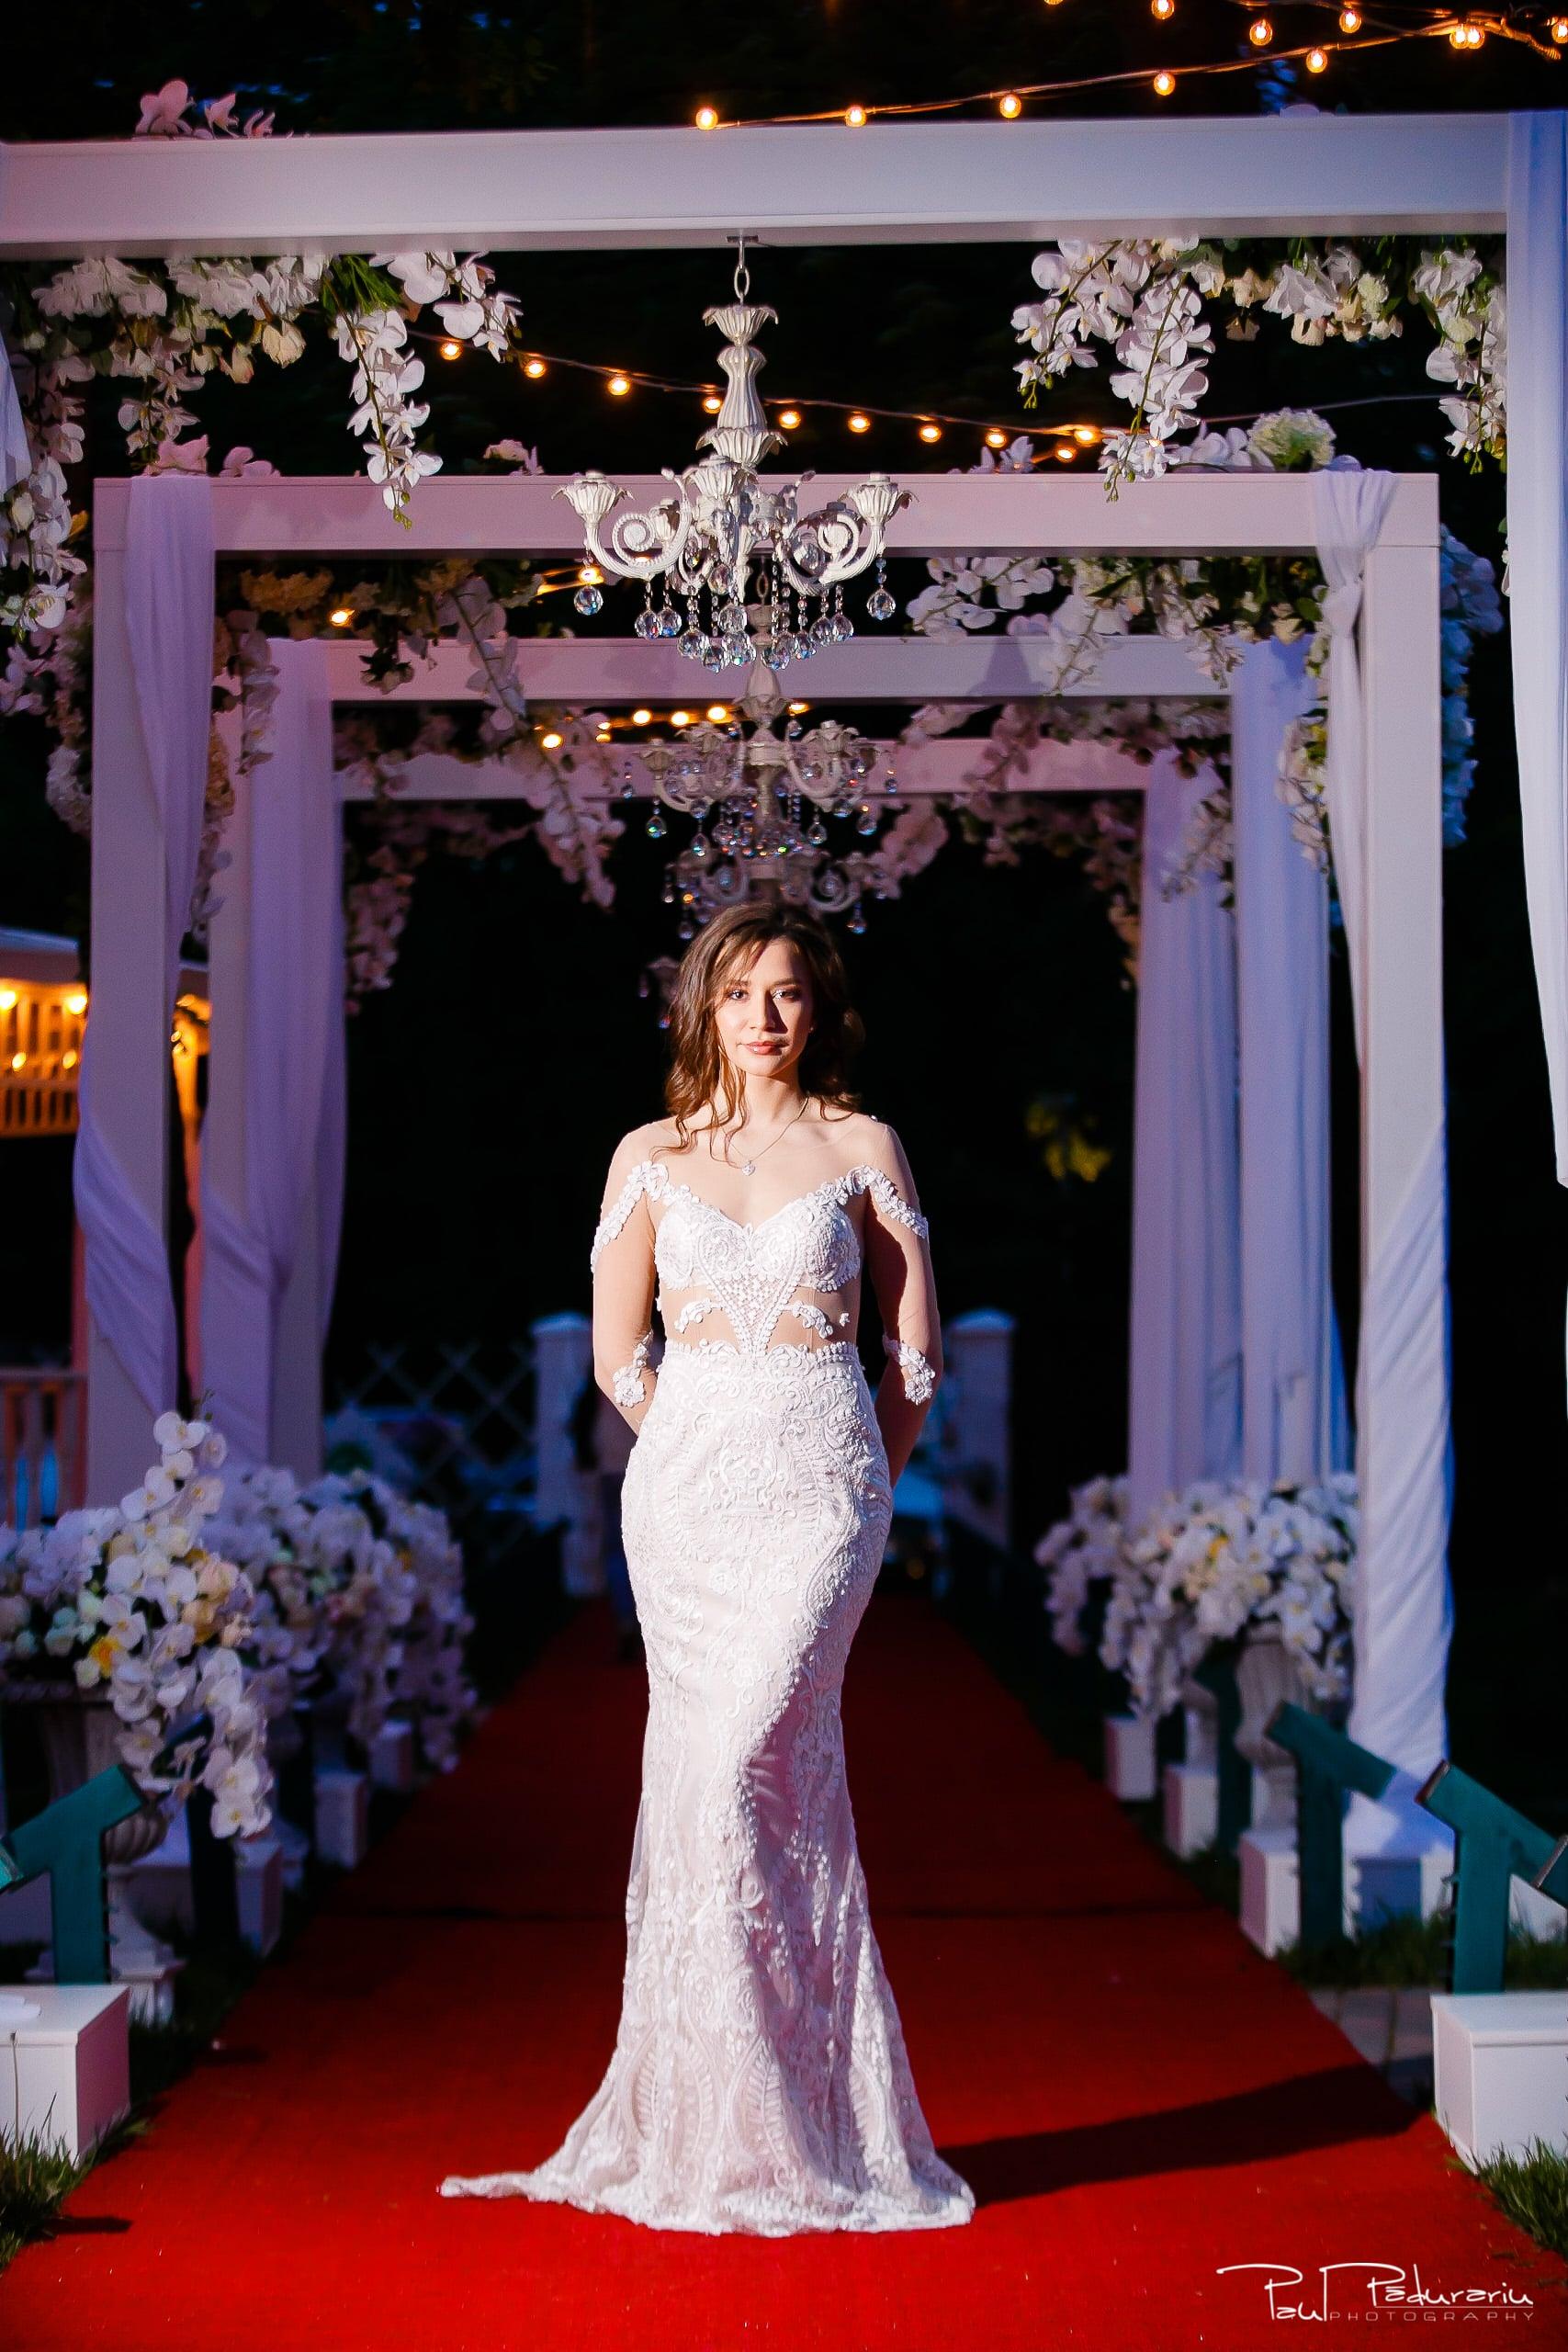 Modern Bride Edith Val colectie rochie mireasa 2019 - fotograf profesionist iasi paul padurariu | nunta iasi 14